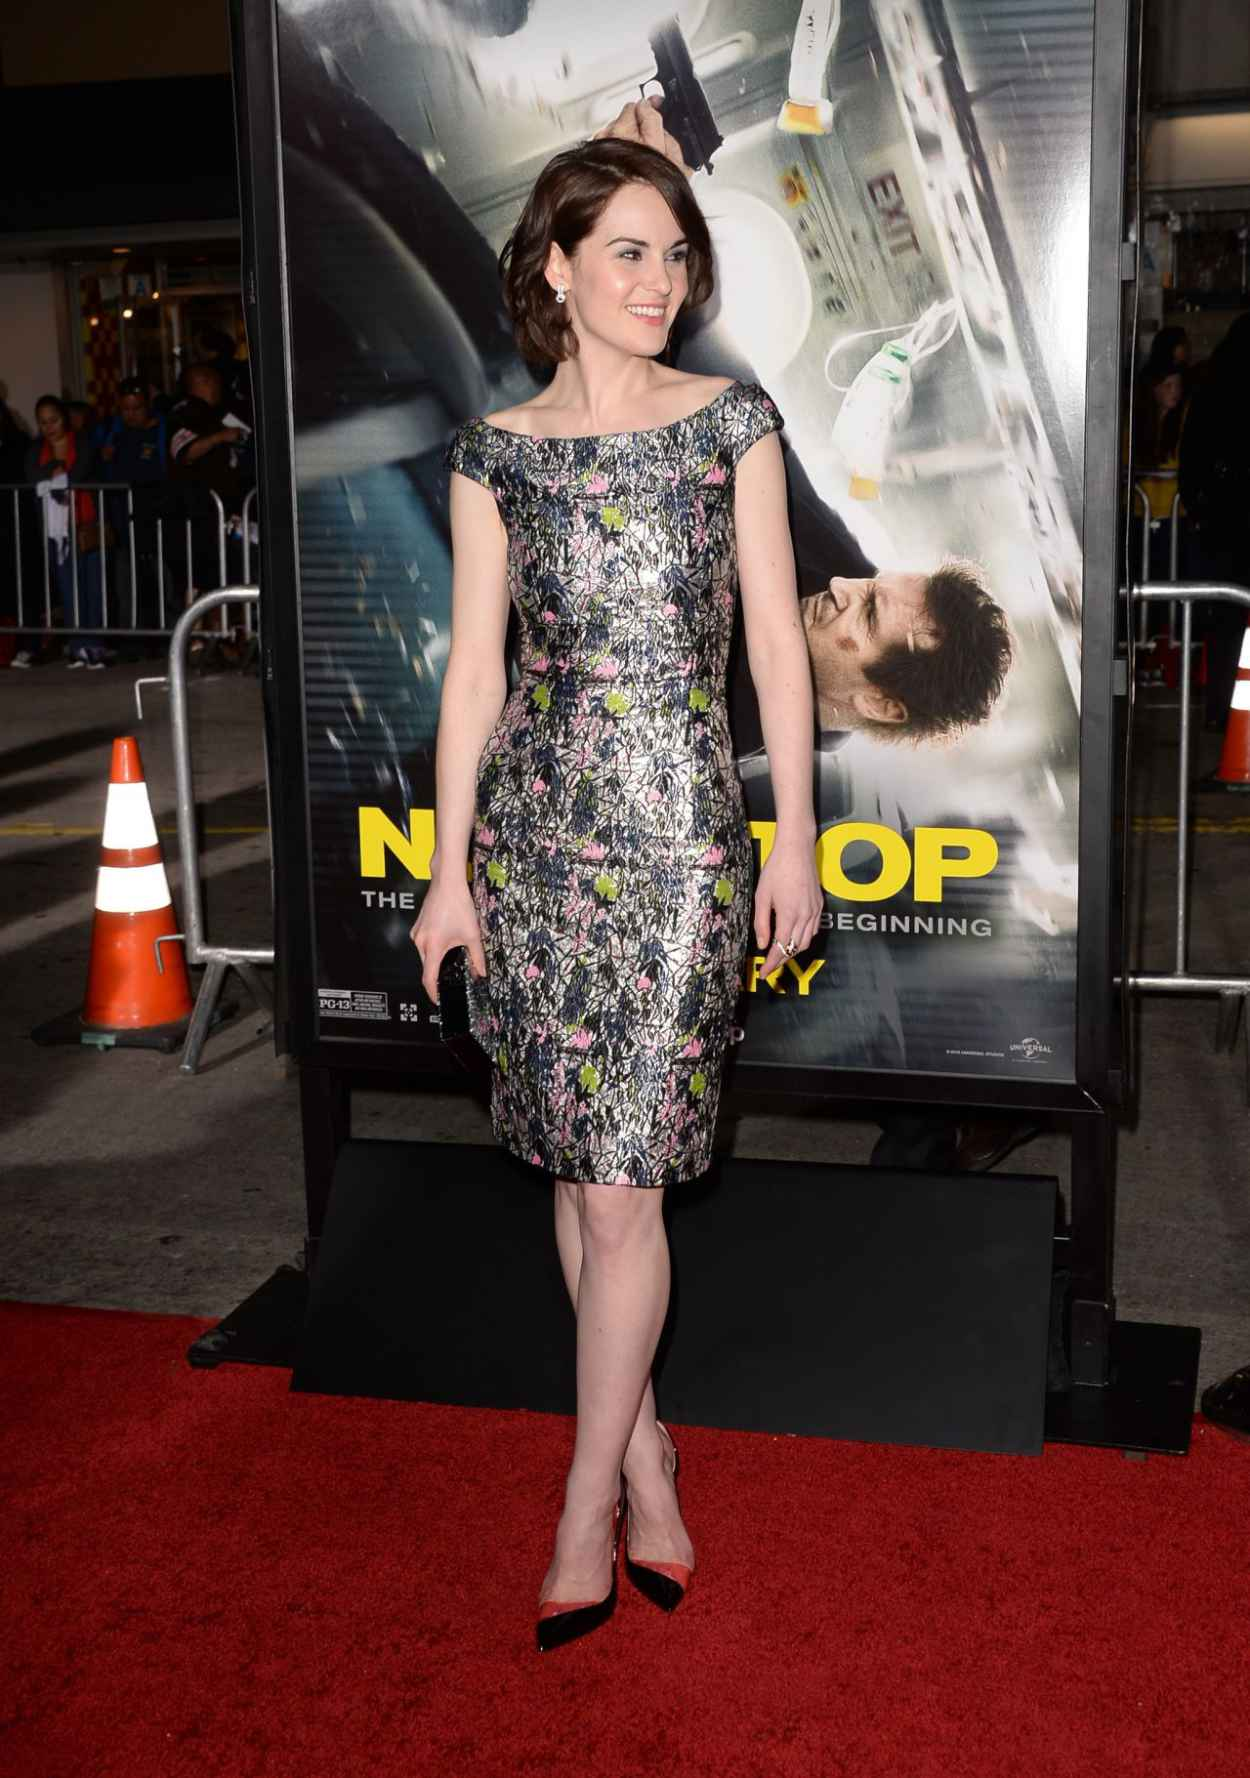 Michelle Dockery Wearing Christian Dior Lurex Dress - -Non-Stop- LA Premiere-3